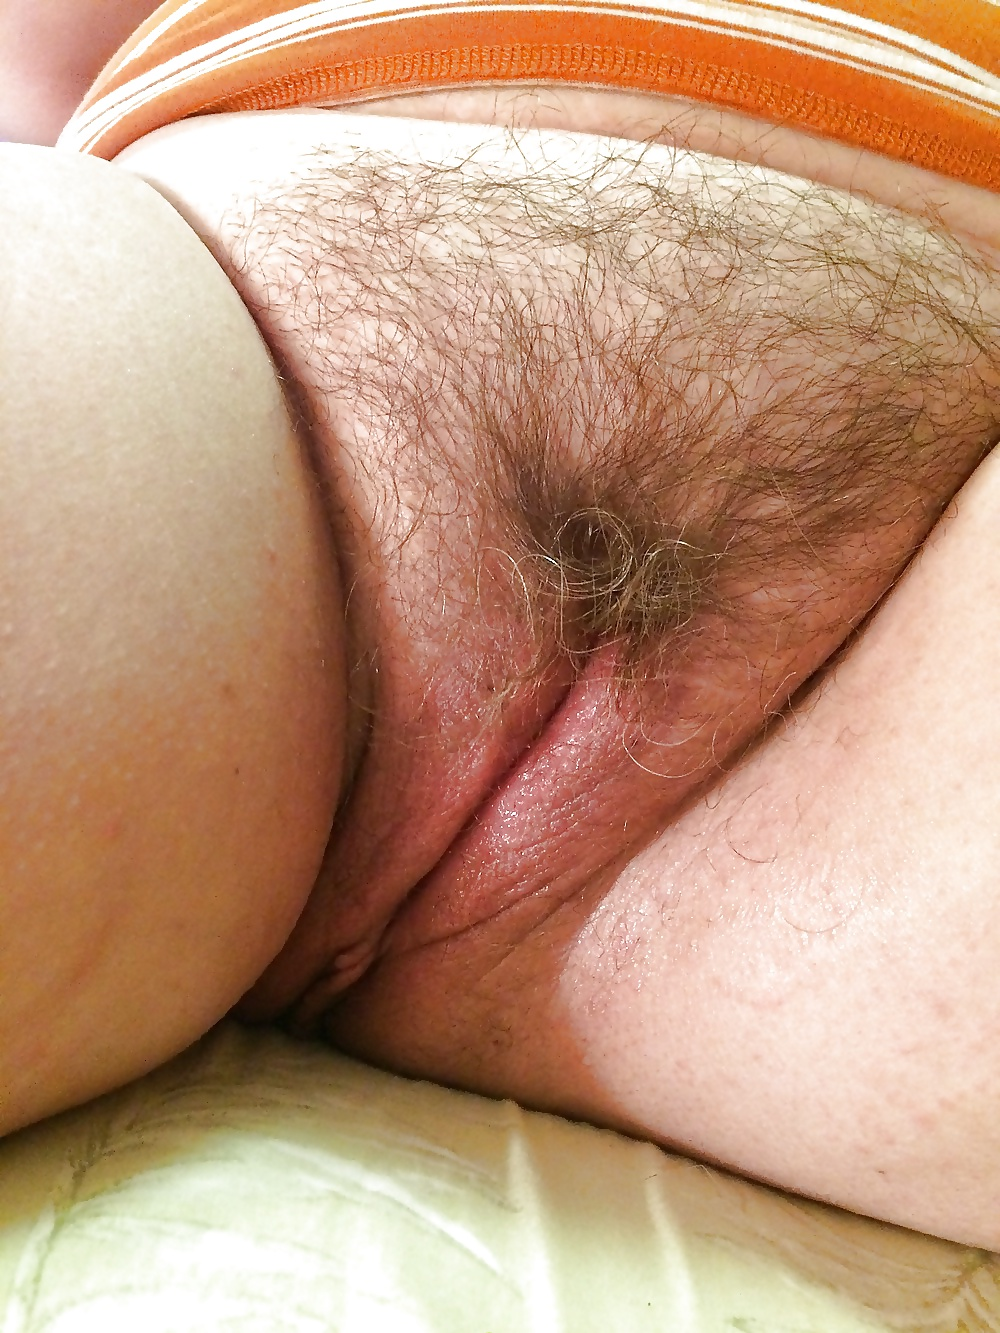 Grosse Muschi hat dicke Titten meistetns. - Bild 5